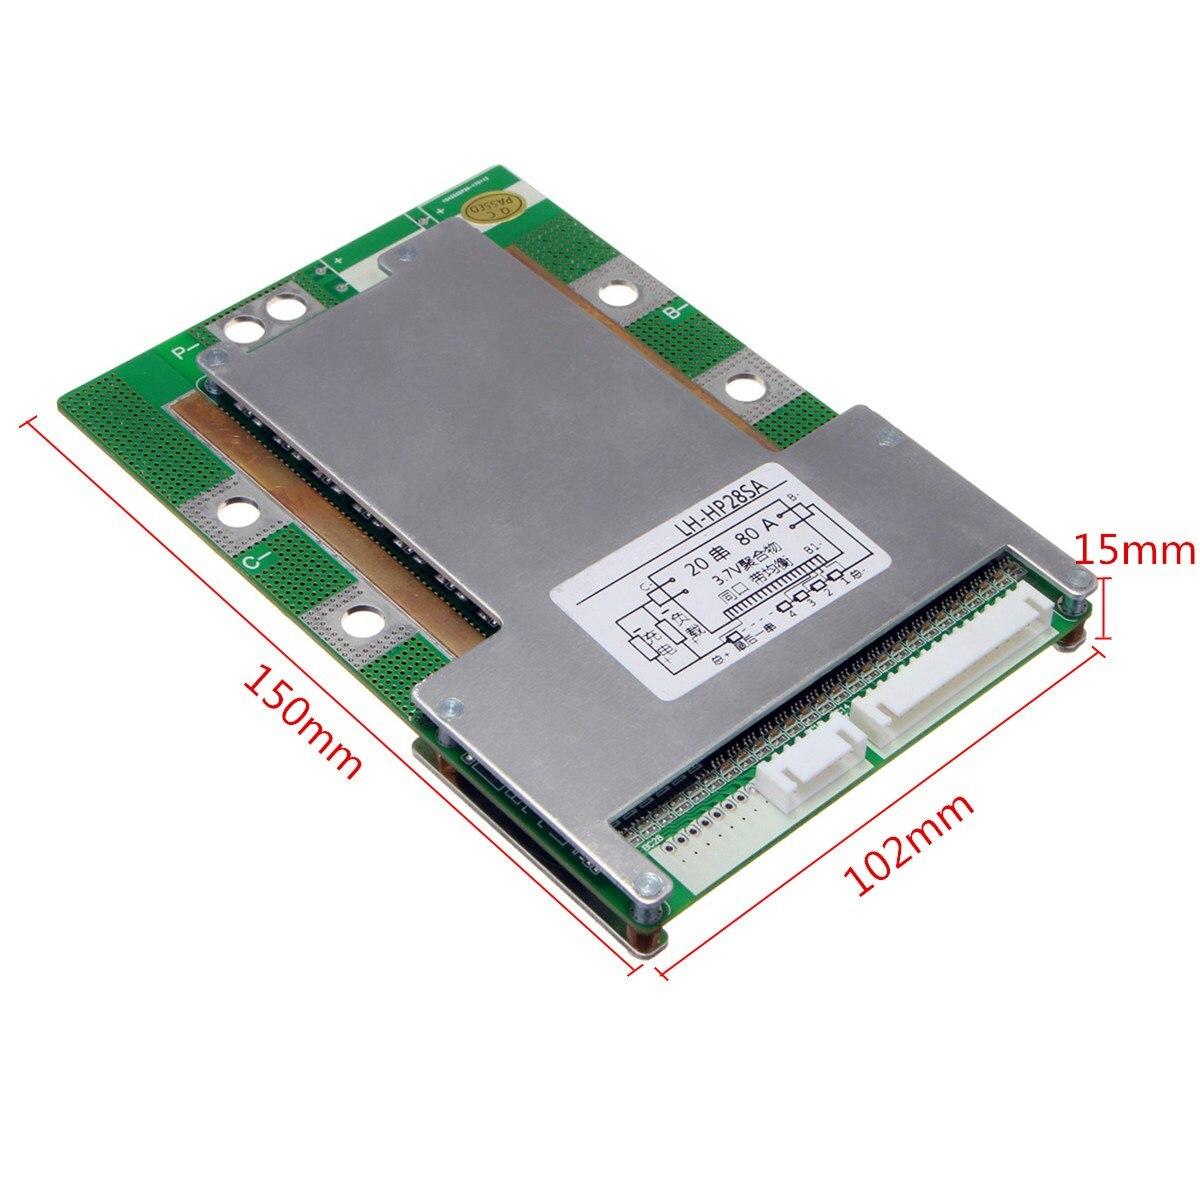 Hot Sale 1PC 20S 72V(84V) 80A 18650 Li-ion Lithium Battery Protection Board BMS MOS + Balance Module